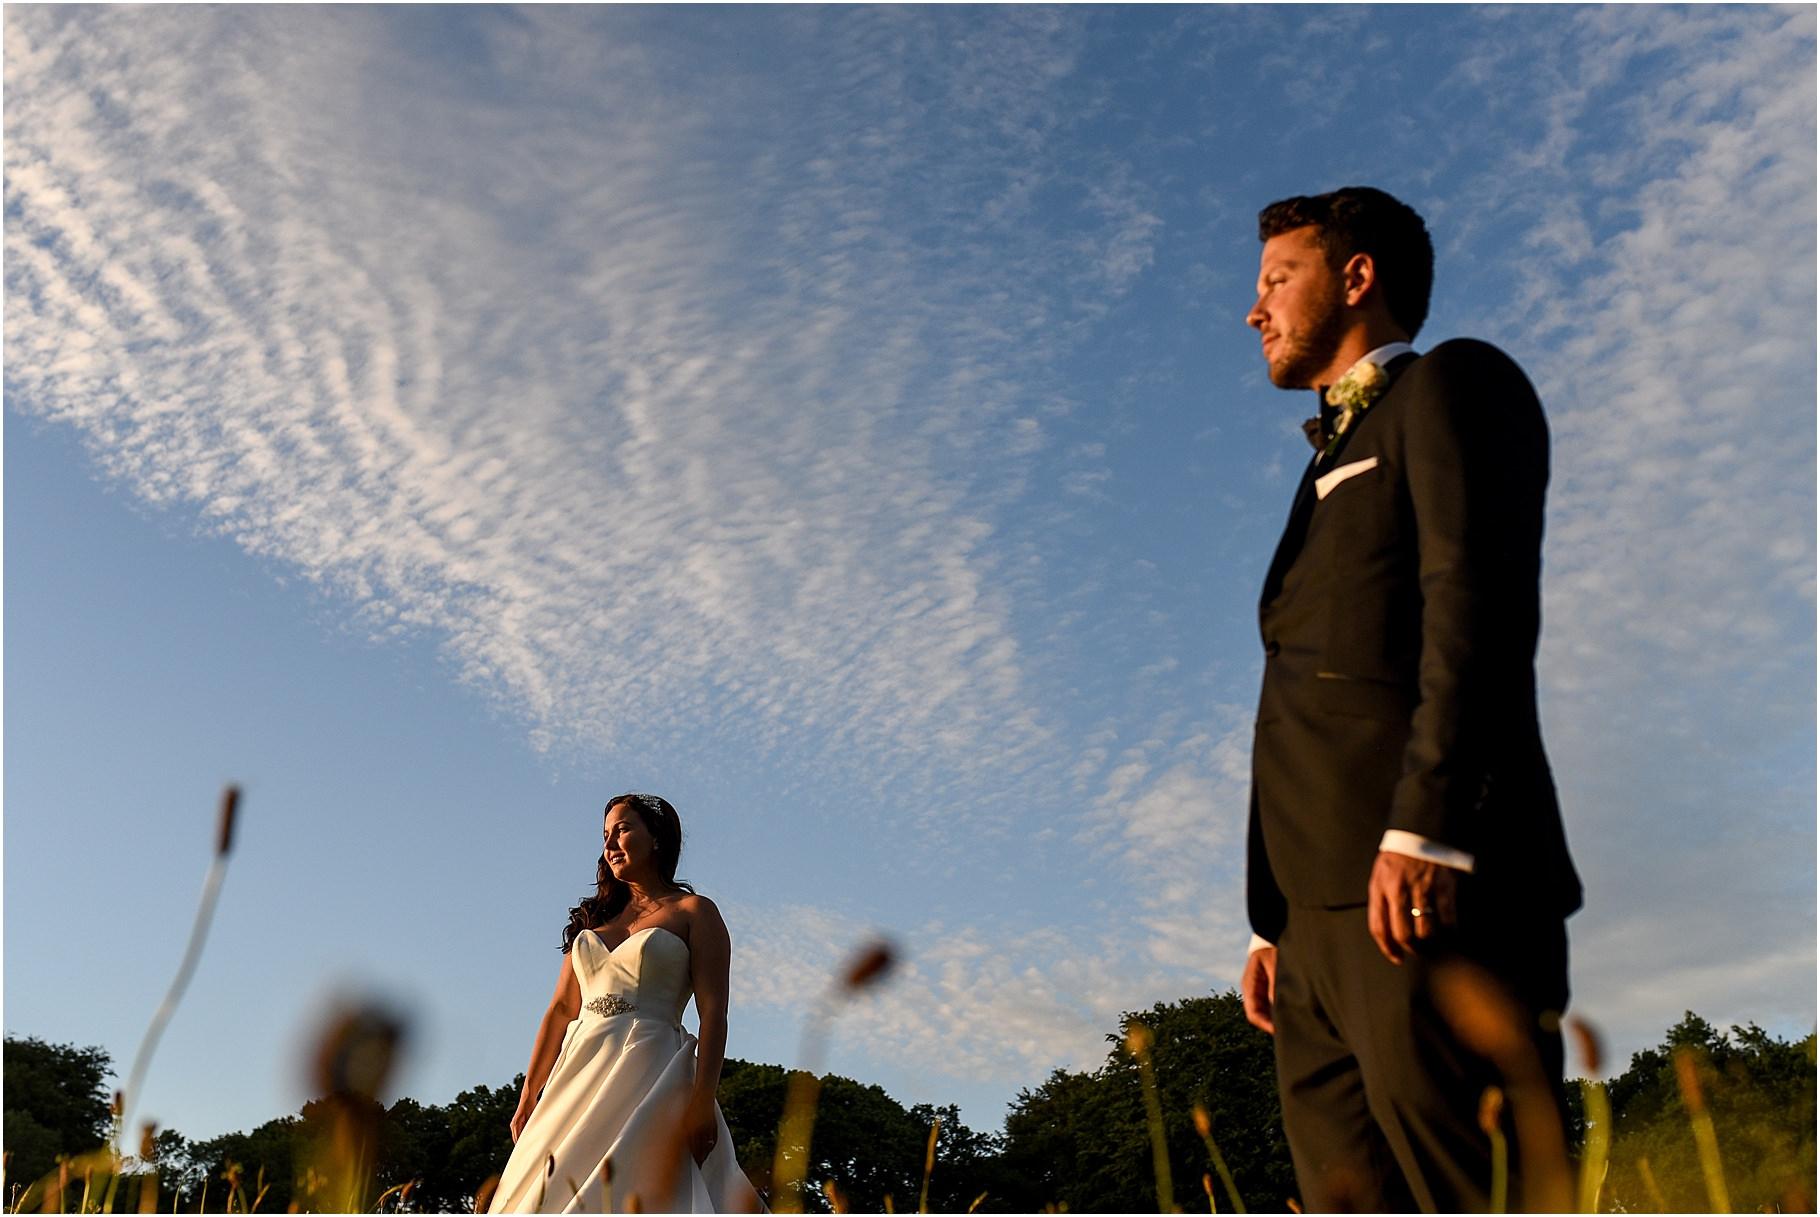 dan-wootton-photography-2017-weddings-181.jpg